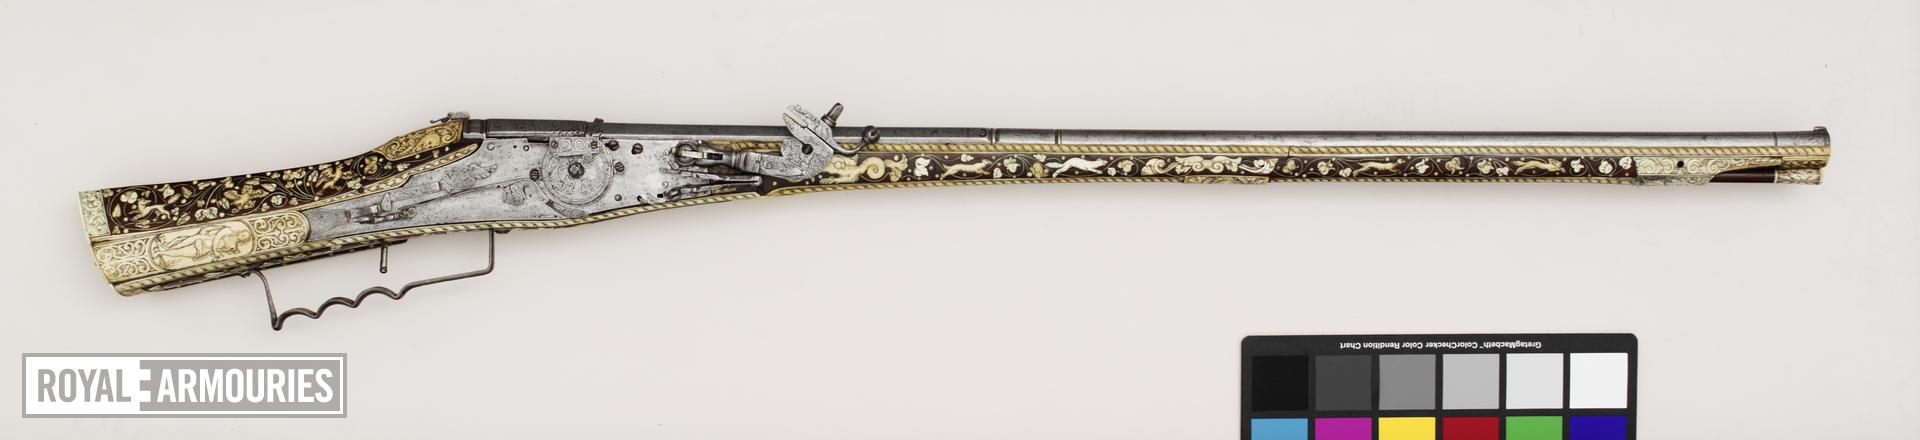 Flintlock gun - By Arnold David